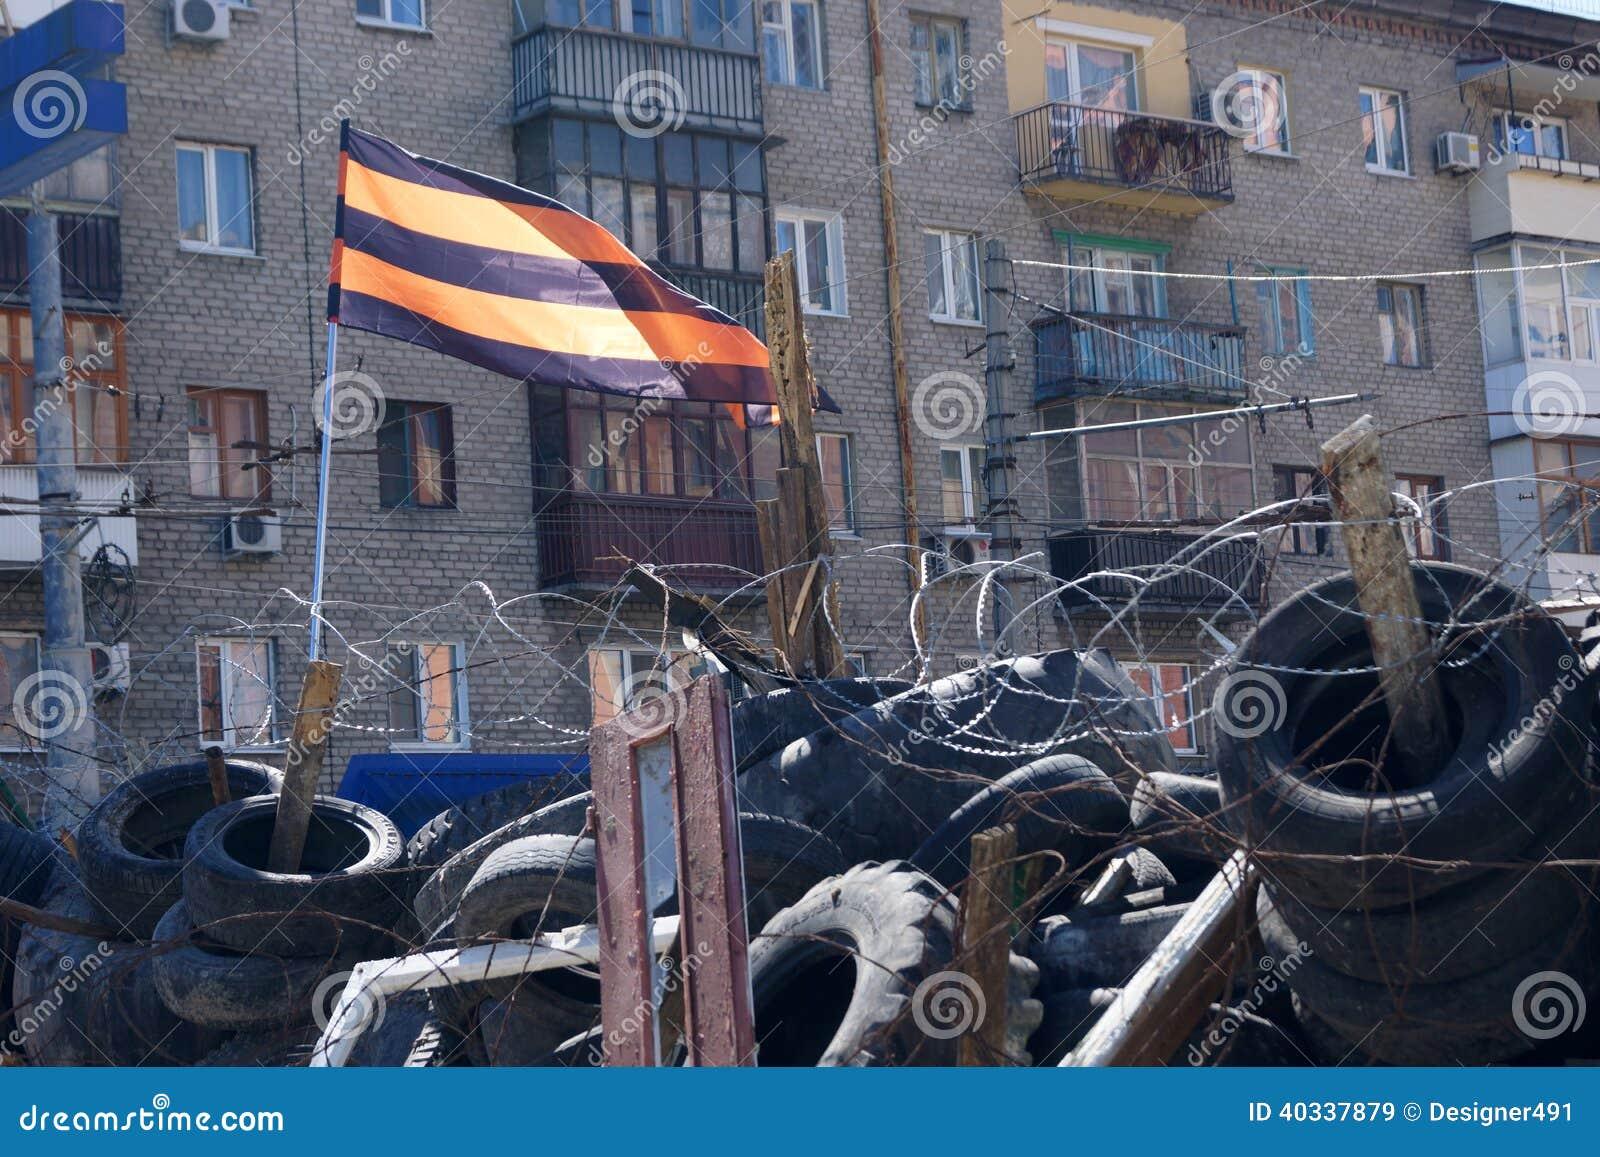 Prorosyjska separatysta flaga nad barykadami. Lugansk, Ukraina